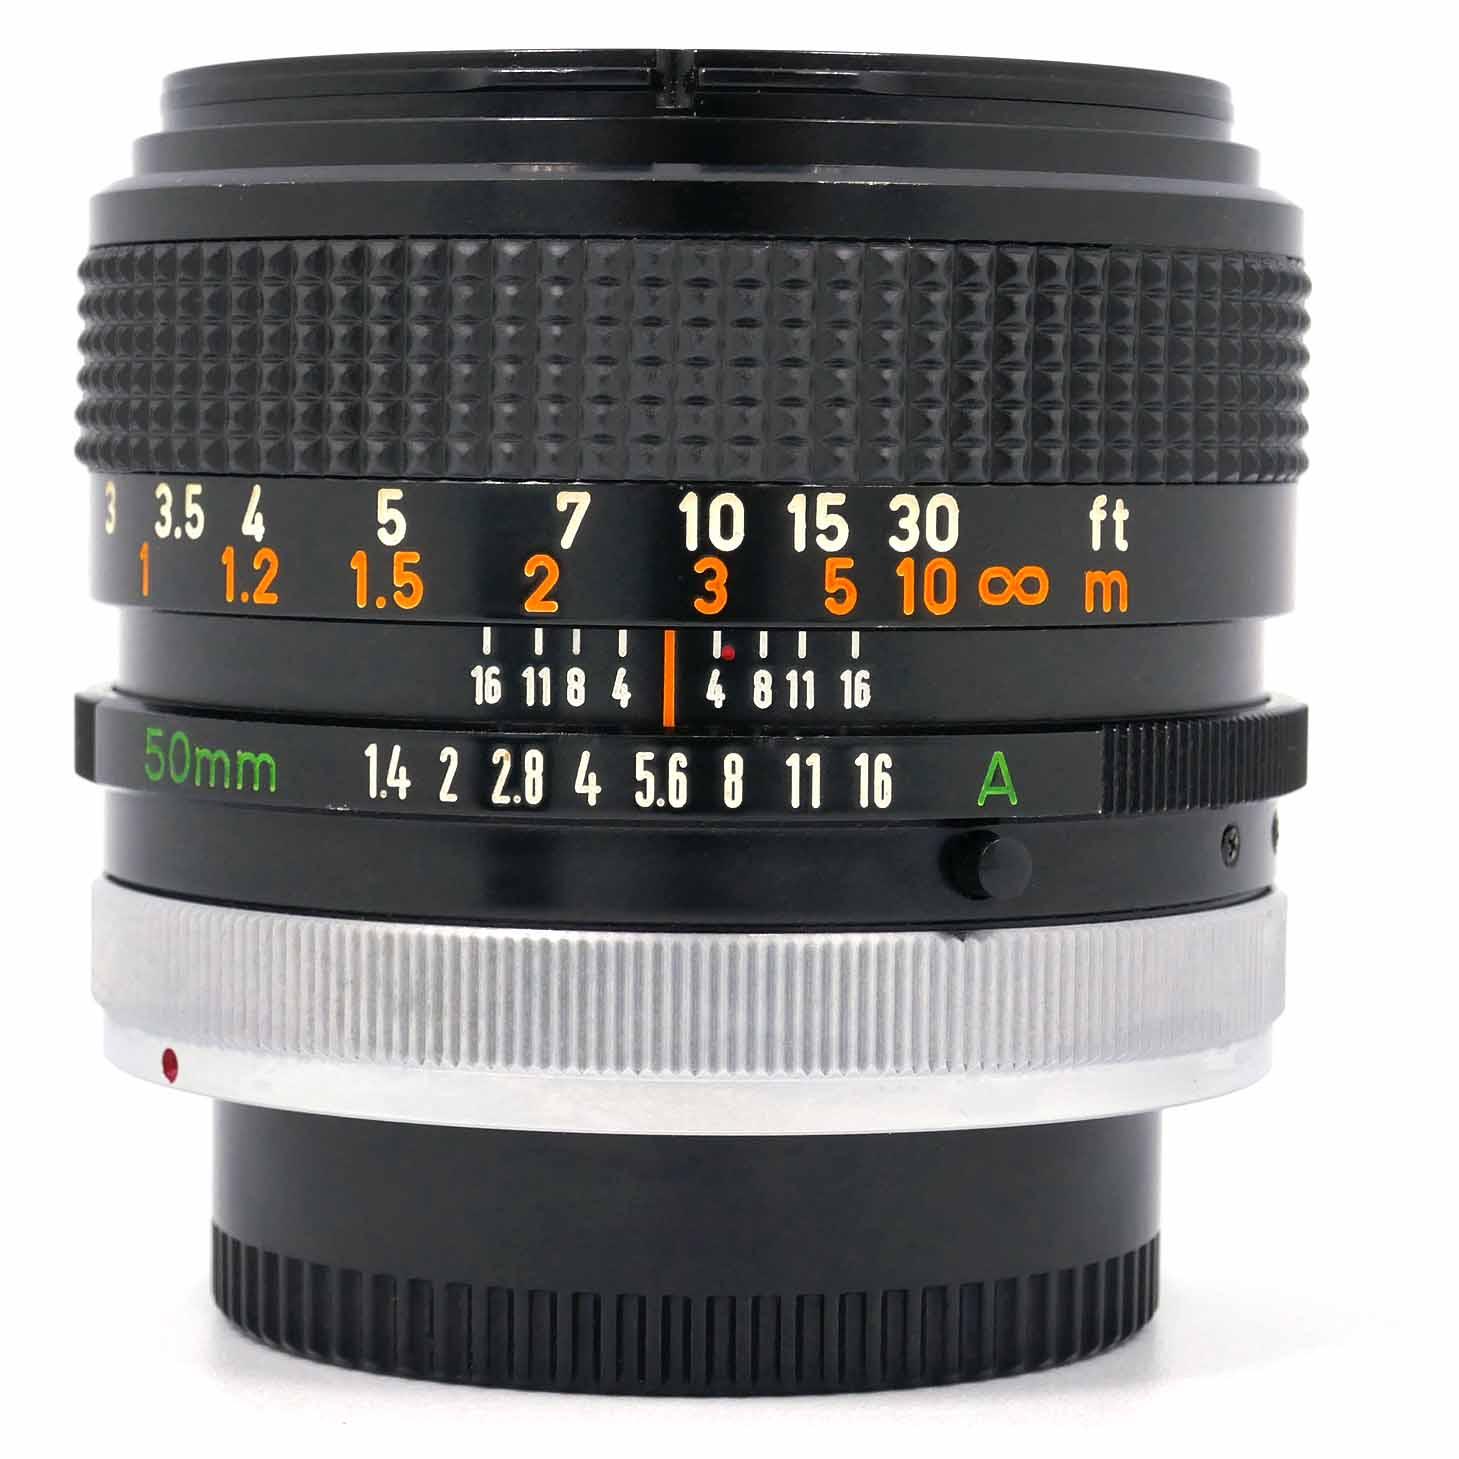 clean-cameras-Canon-FD-50mm-1.4-s.s.c-02